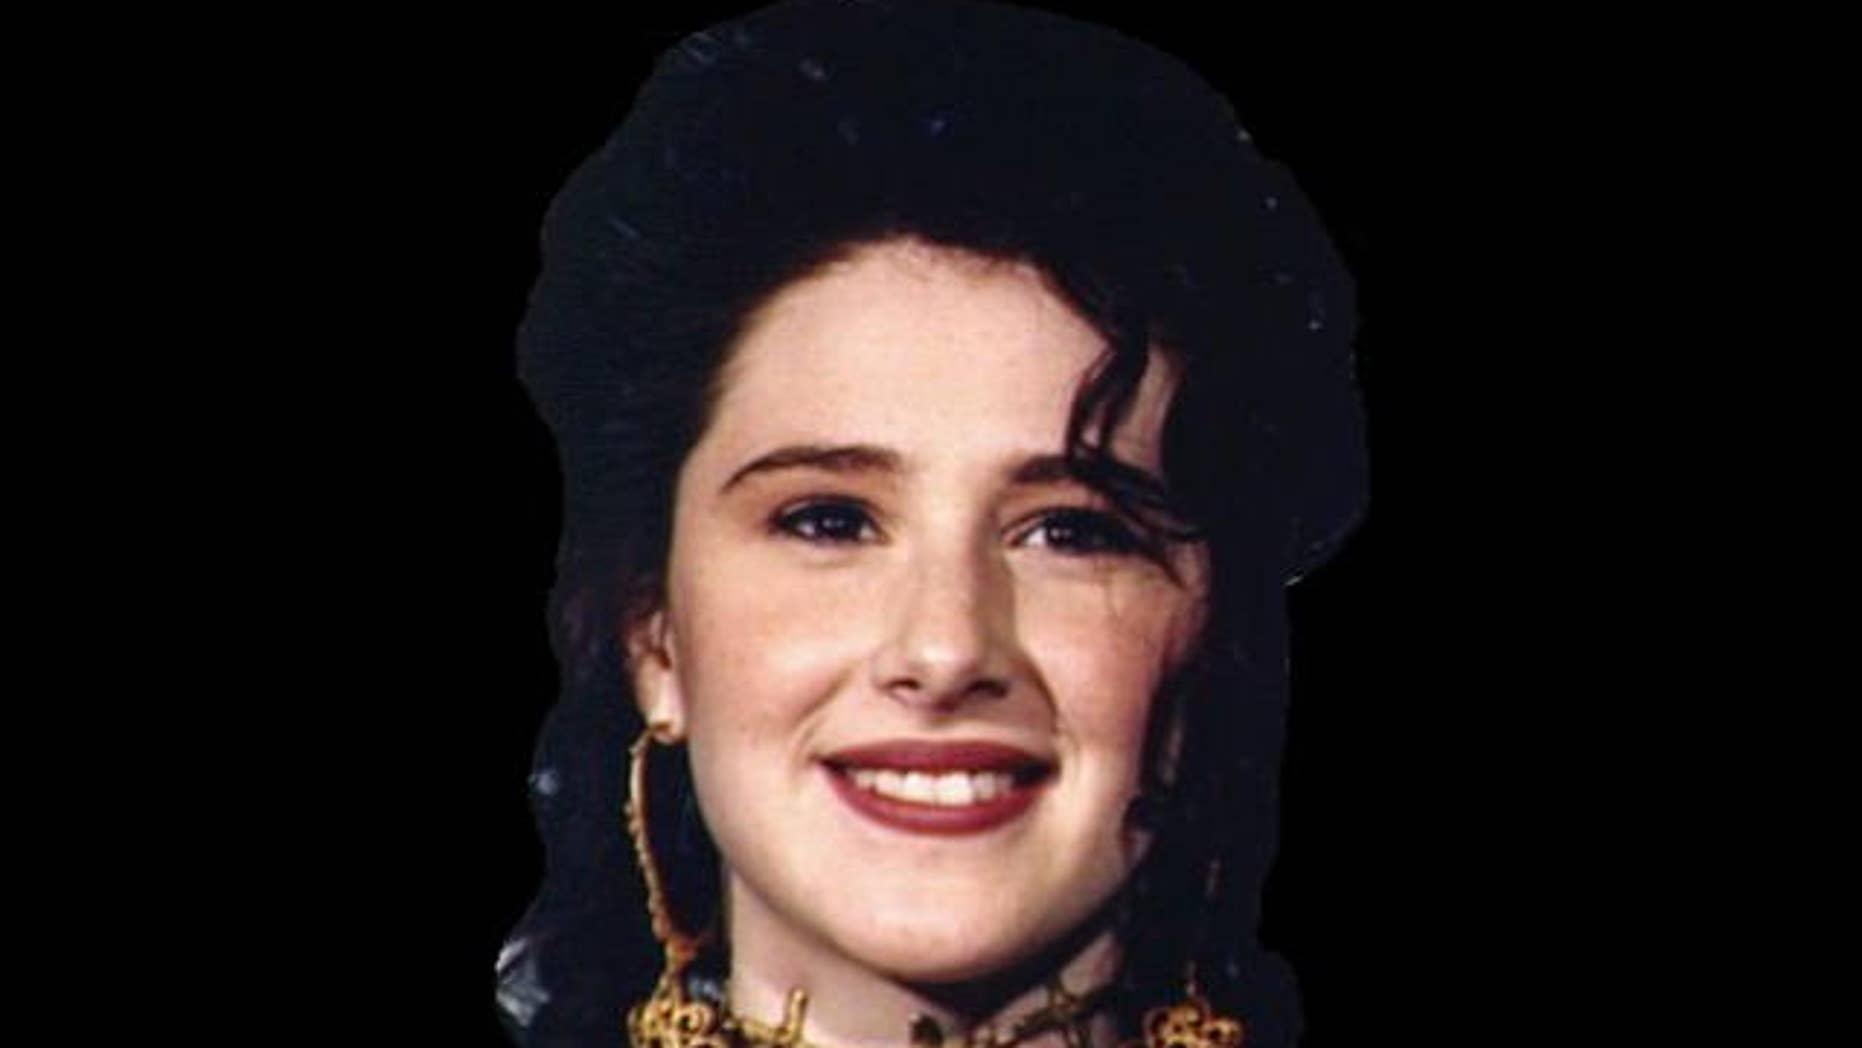 80s singer Tiffany